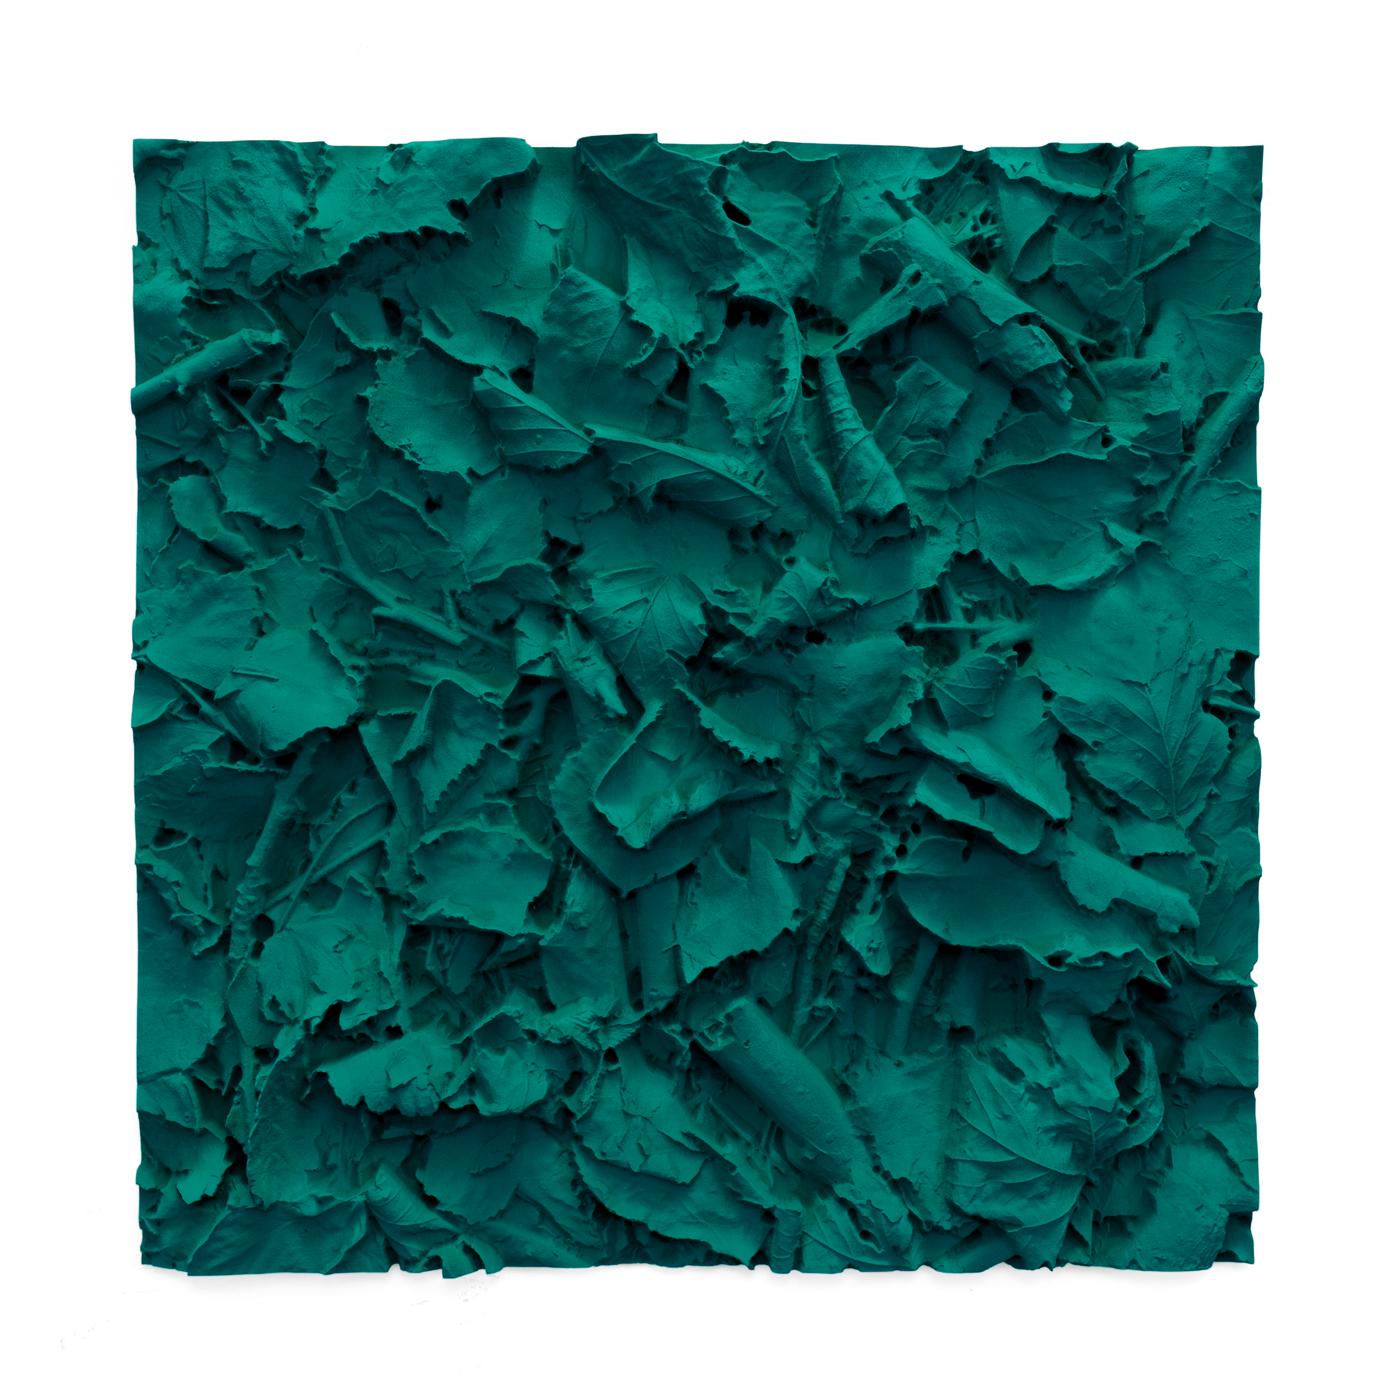 PG7 18 Ground 100x100cm pigmented polyvinyl, polyurethan